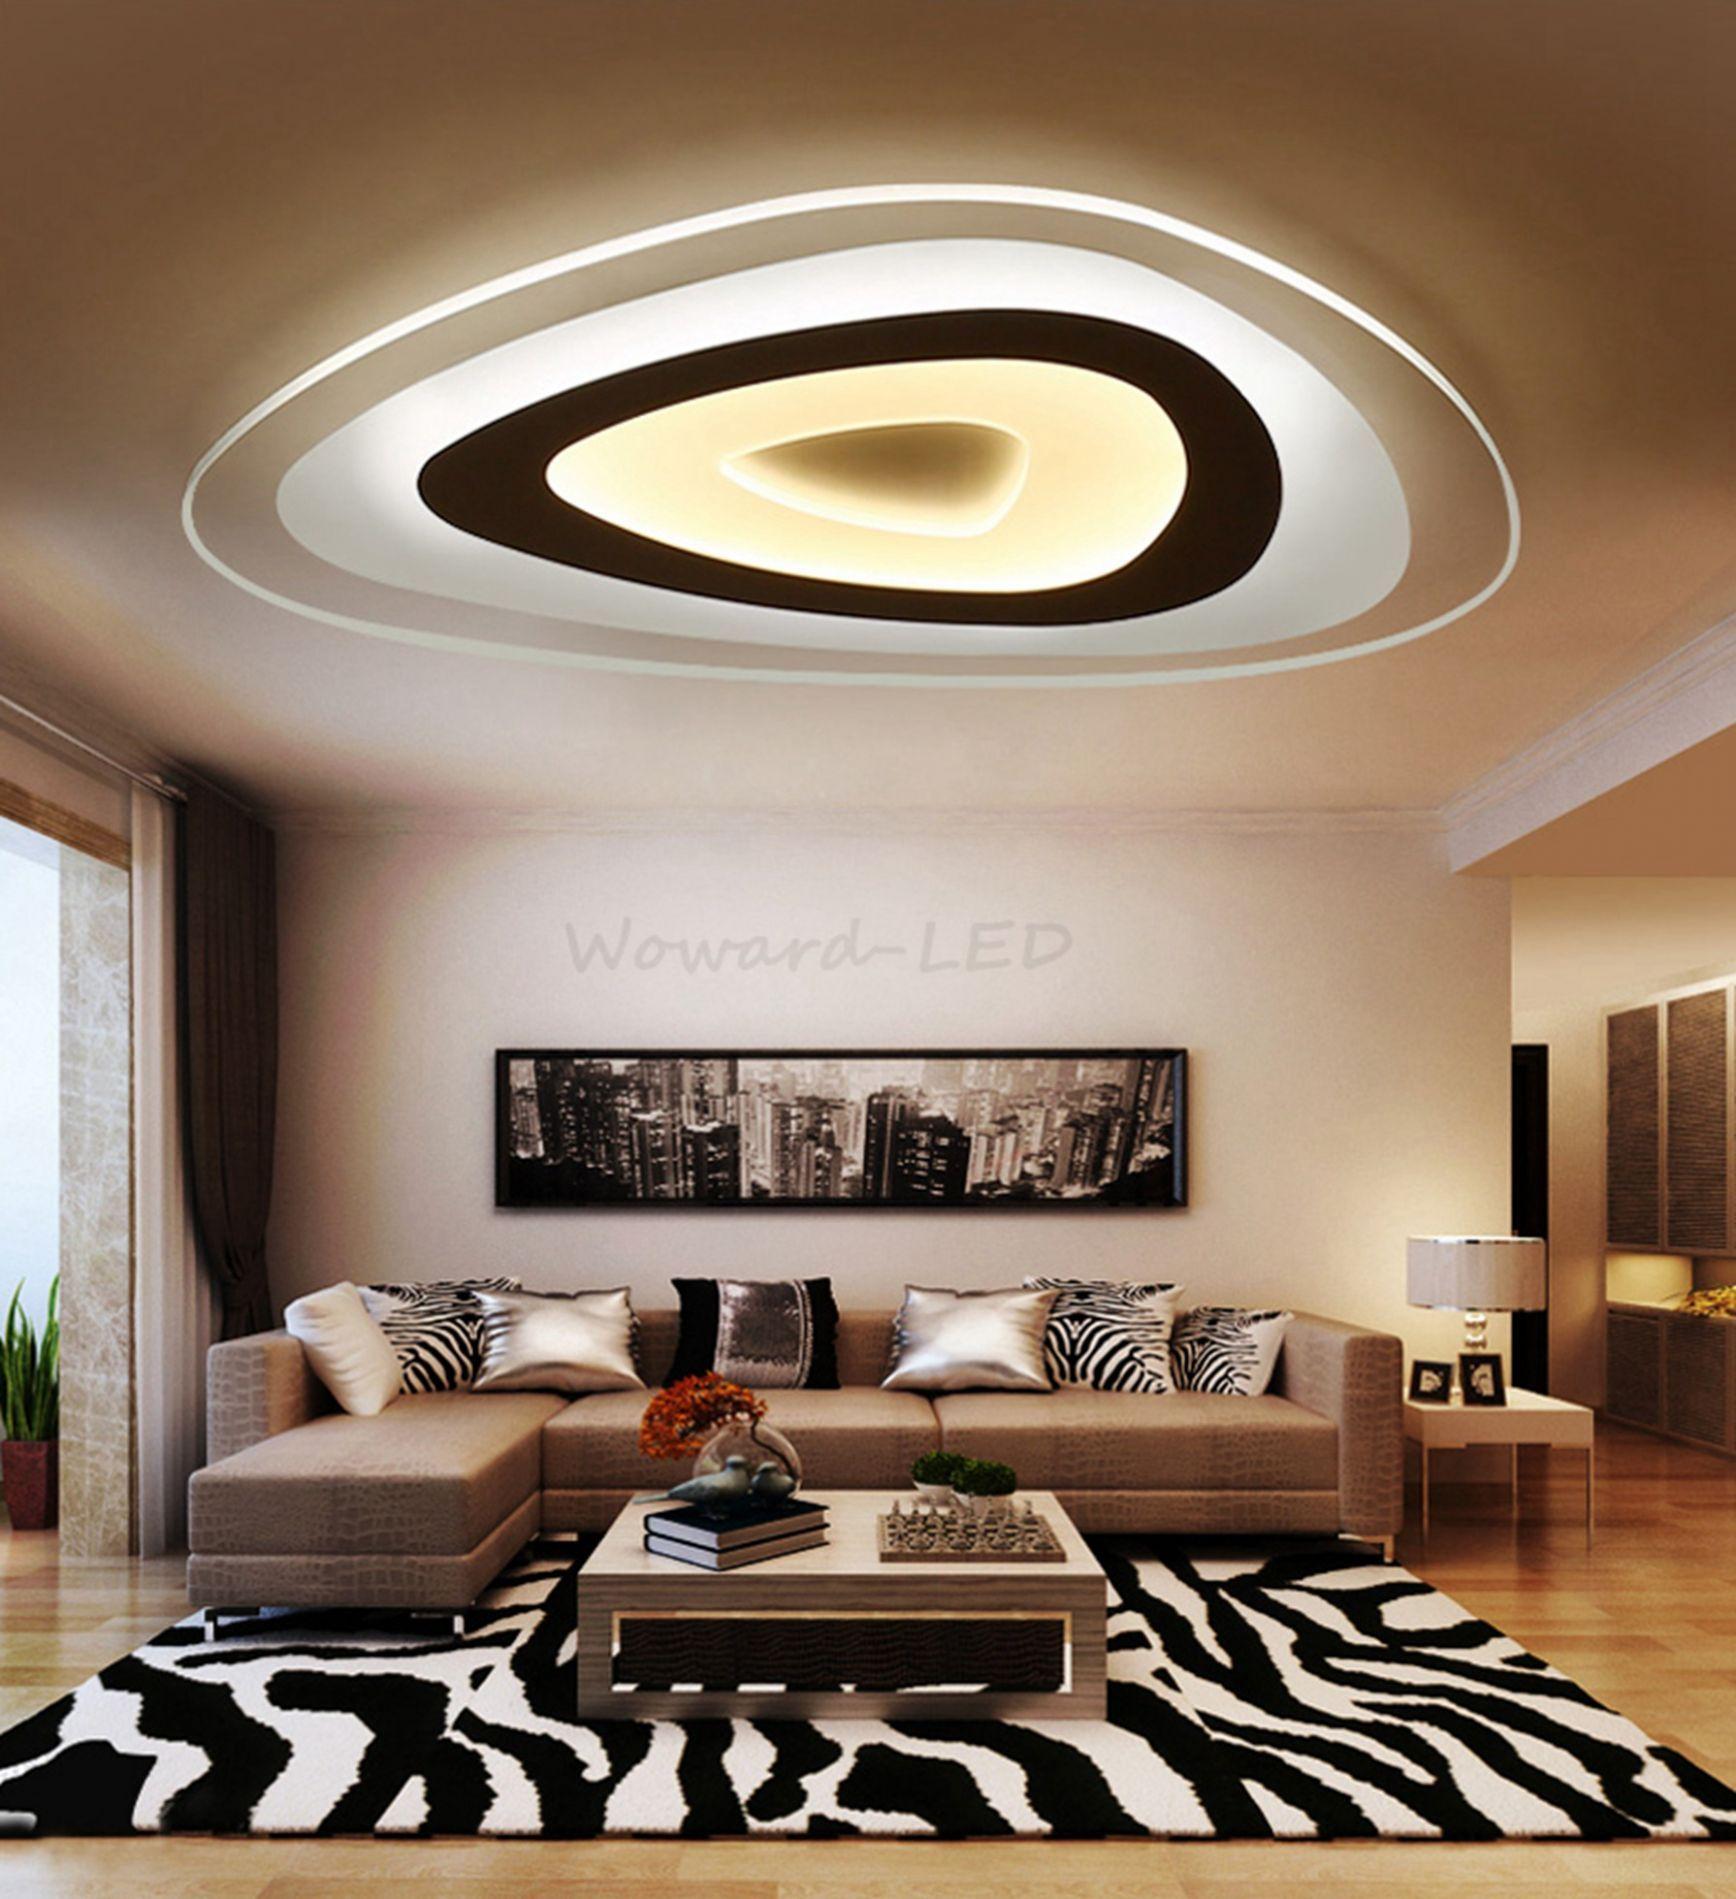 12 Wohnzimmer Lampe Decke Led Dimmbar   Led lampen wohnzimmer ...